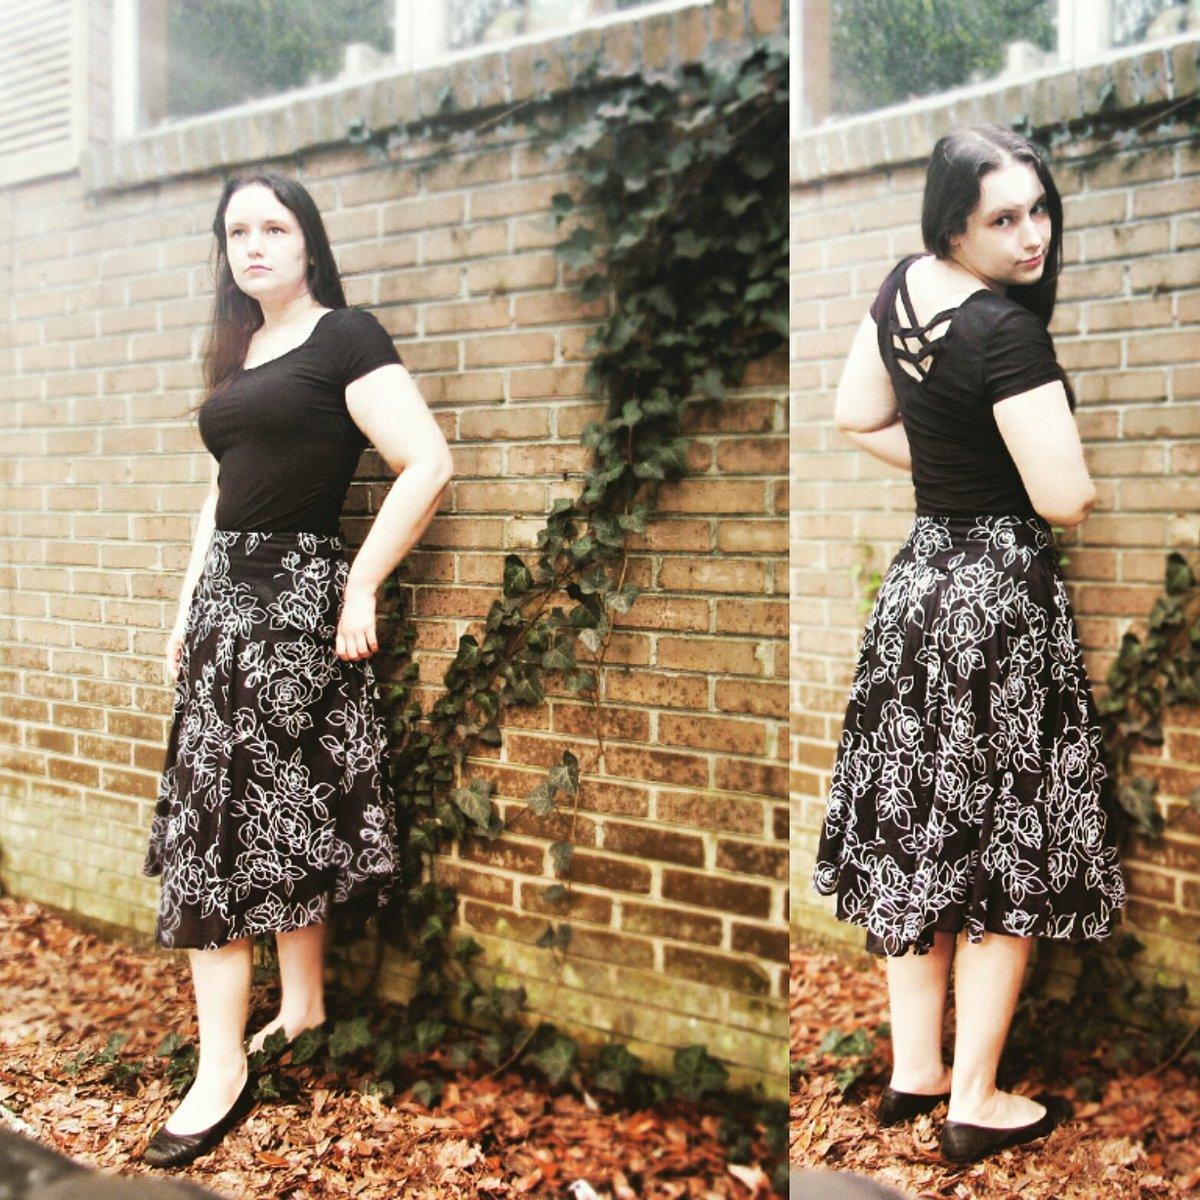 #Summerlook Skirt: @jonesnewyork size 6 #madeinchina #thriftstorefinds #2ndhandbrandname #thrifting Shirt: #noboundaries Juniors Med (7-9) bought at @walmart #summerstyle #skirt #beyoutiful #fashionblogger #modestclothing #clothesaddict #ilovedresses #girlyoutfits #outfitofthedaypic.twitter.com/xqqsnG9eII